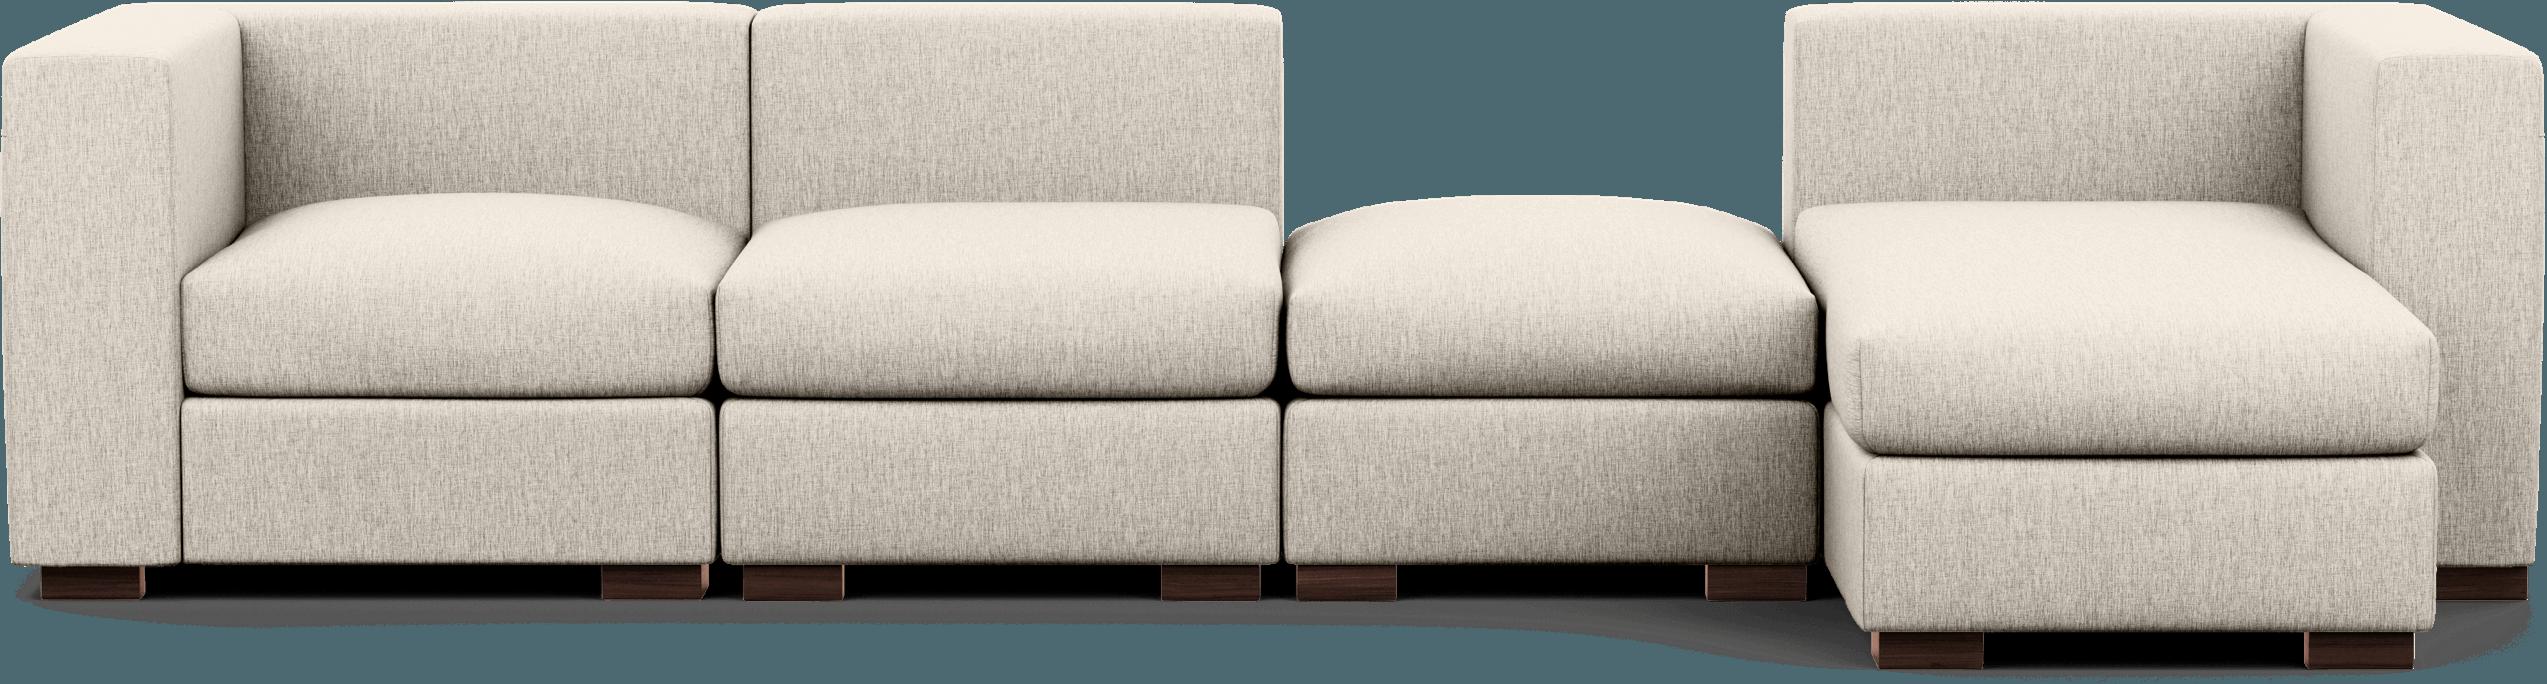 Interior Define - Toby Modular